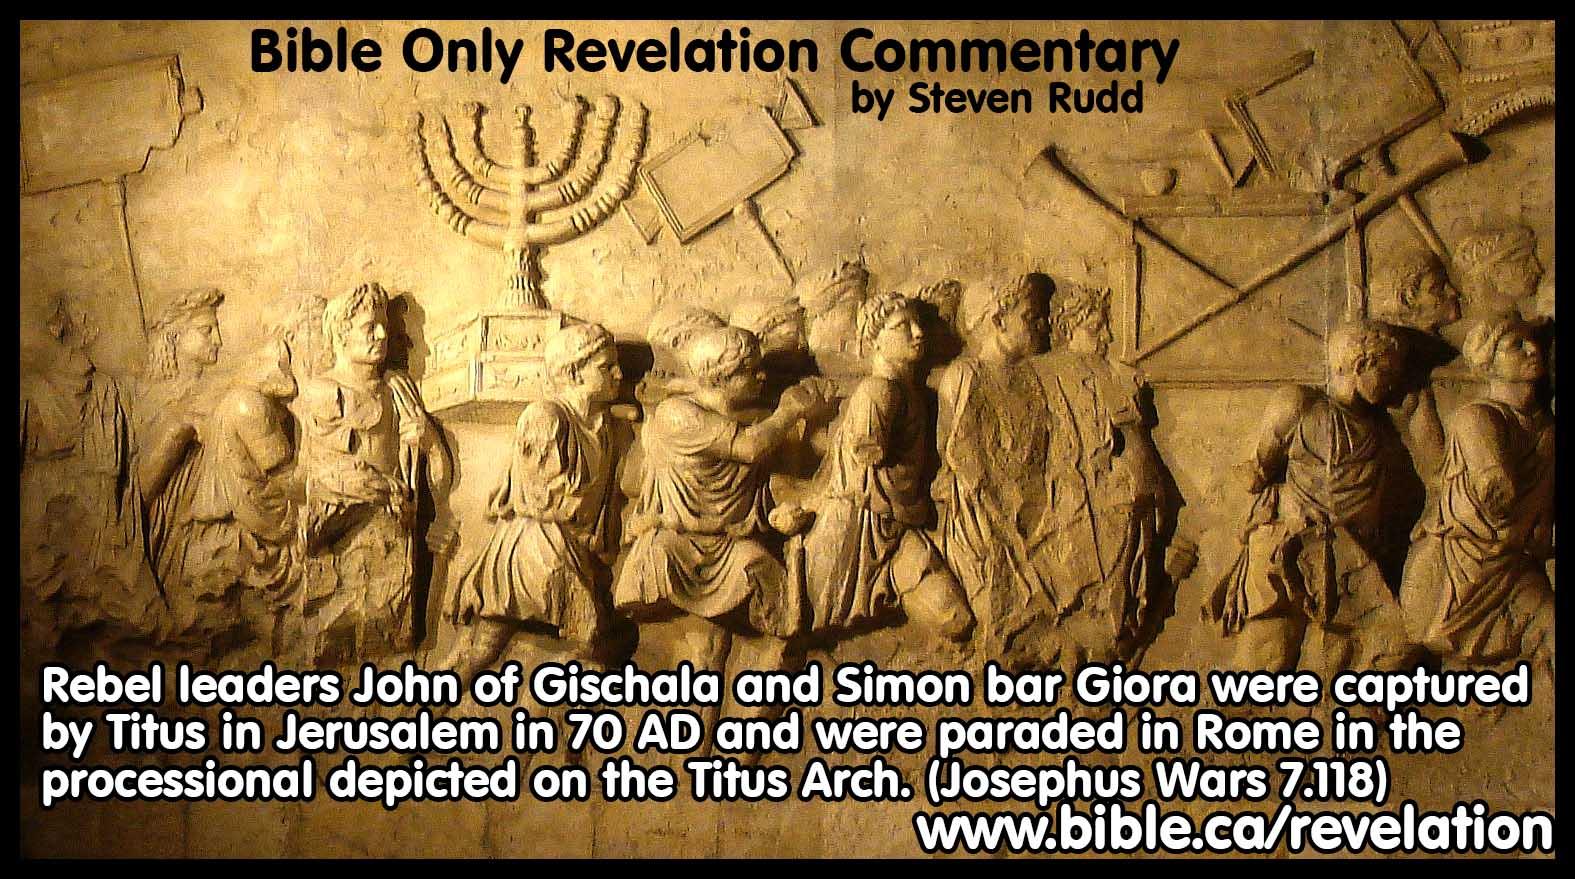 Flavius Josephus Chronology of the Destruction of